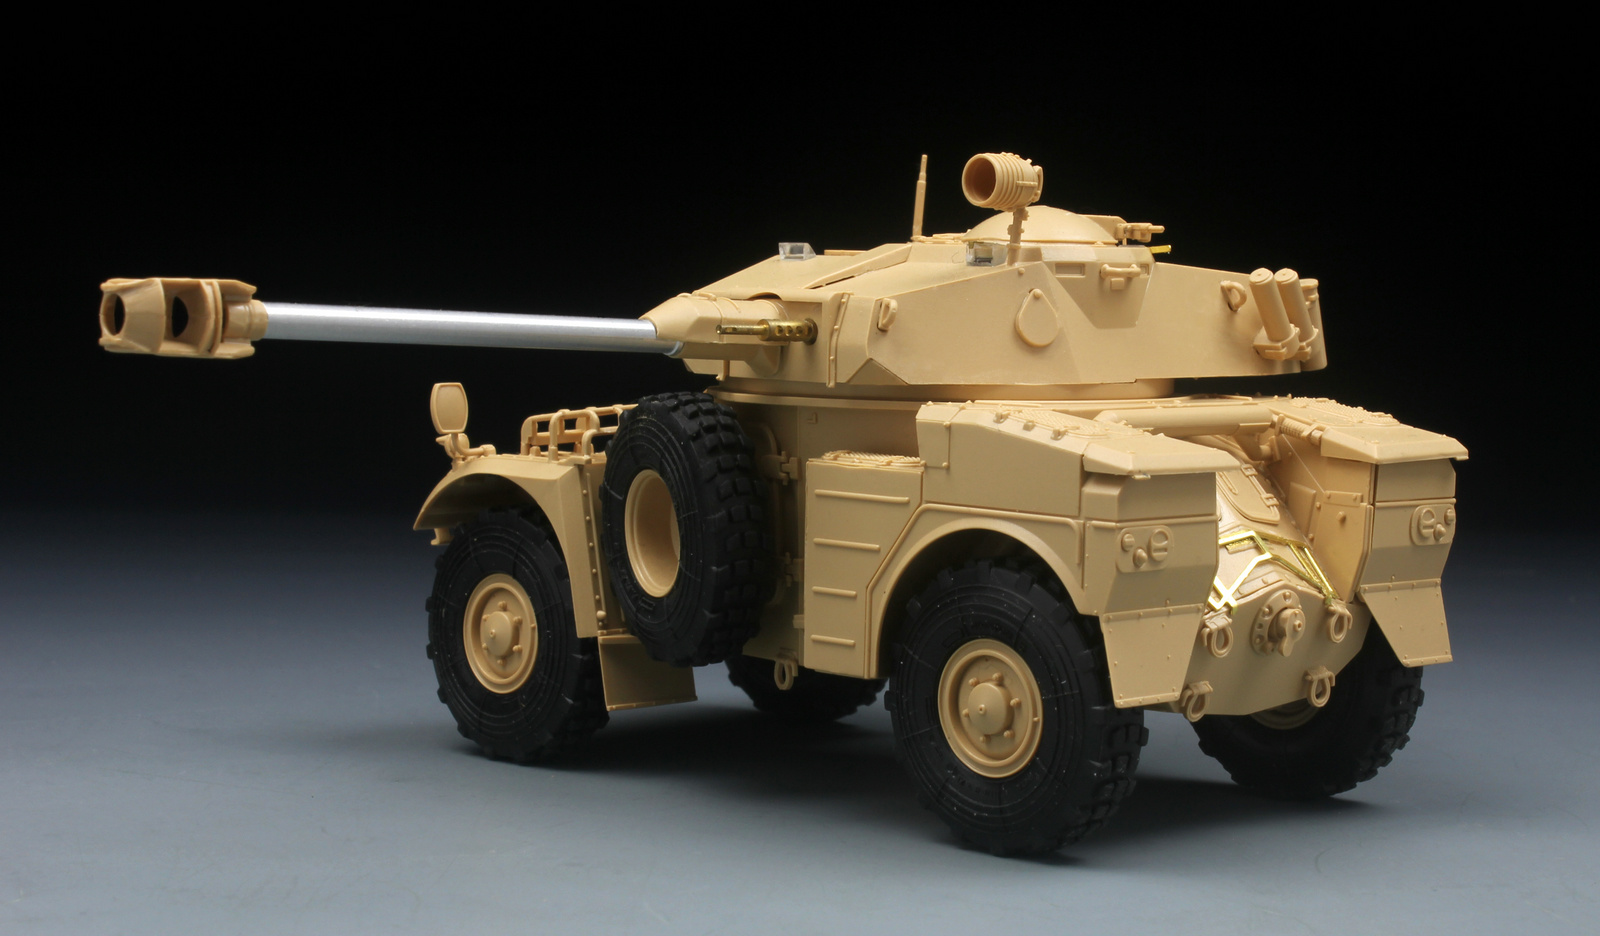 Tiger Model Panhard  Aml-90  - Tiger Model - Scale 1/35 - TIGE4635